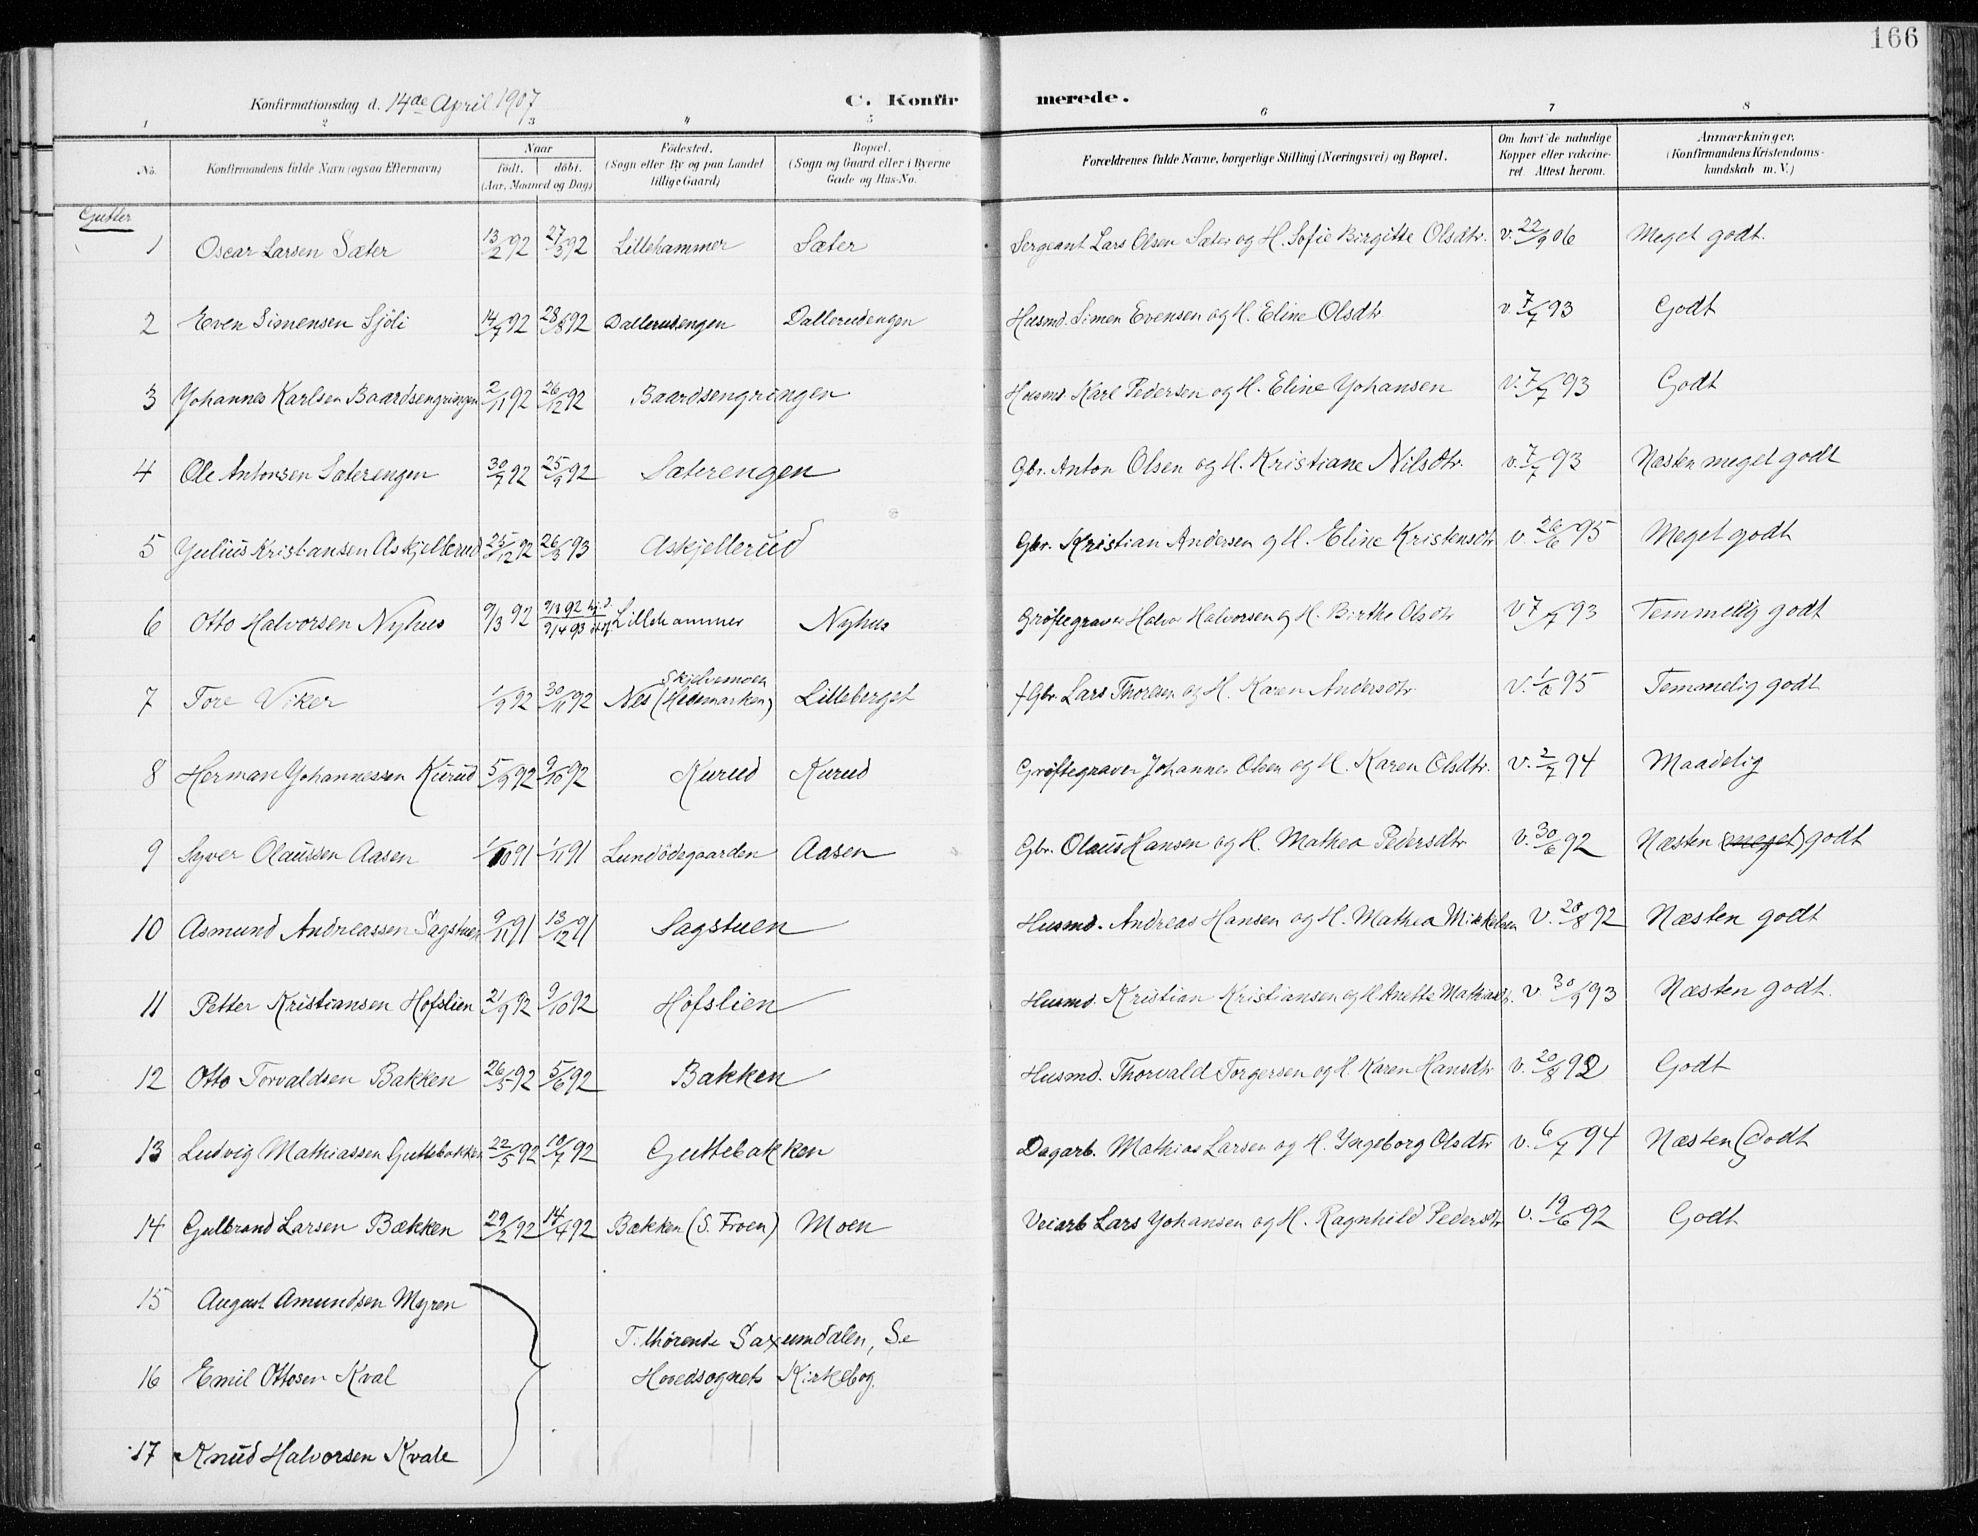 SAH, Fåberg prestekontor, Ministerialbok nr. 11, 1899-1913, s. 166